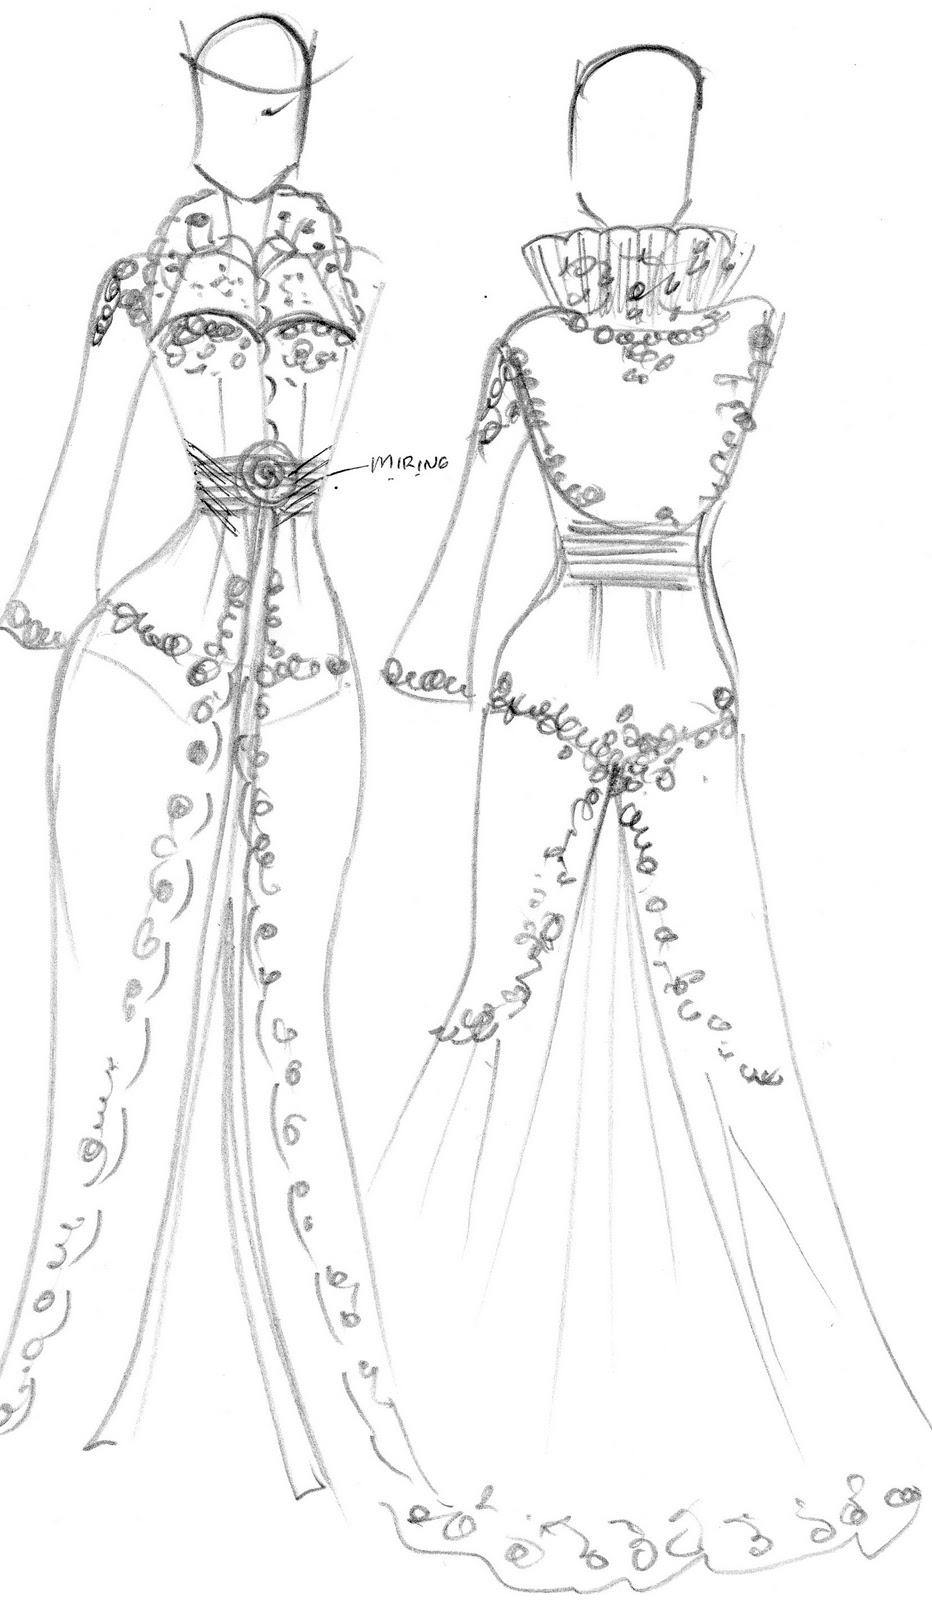 whulyan butik & dressmaker: November 2011